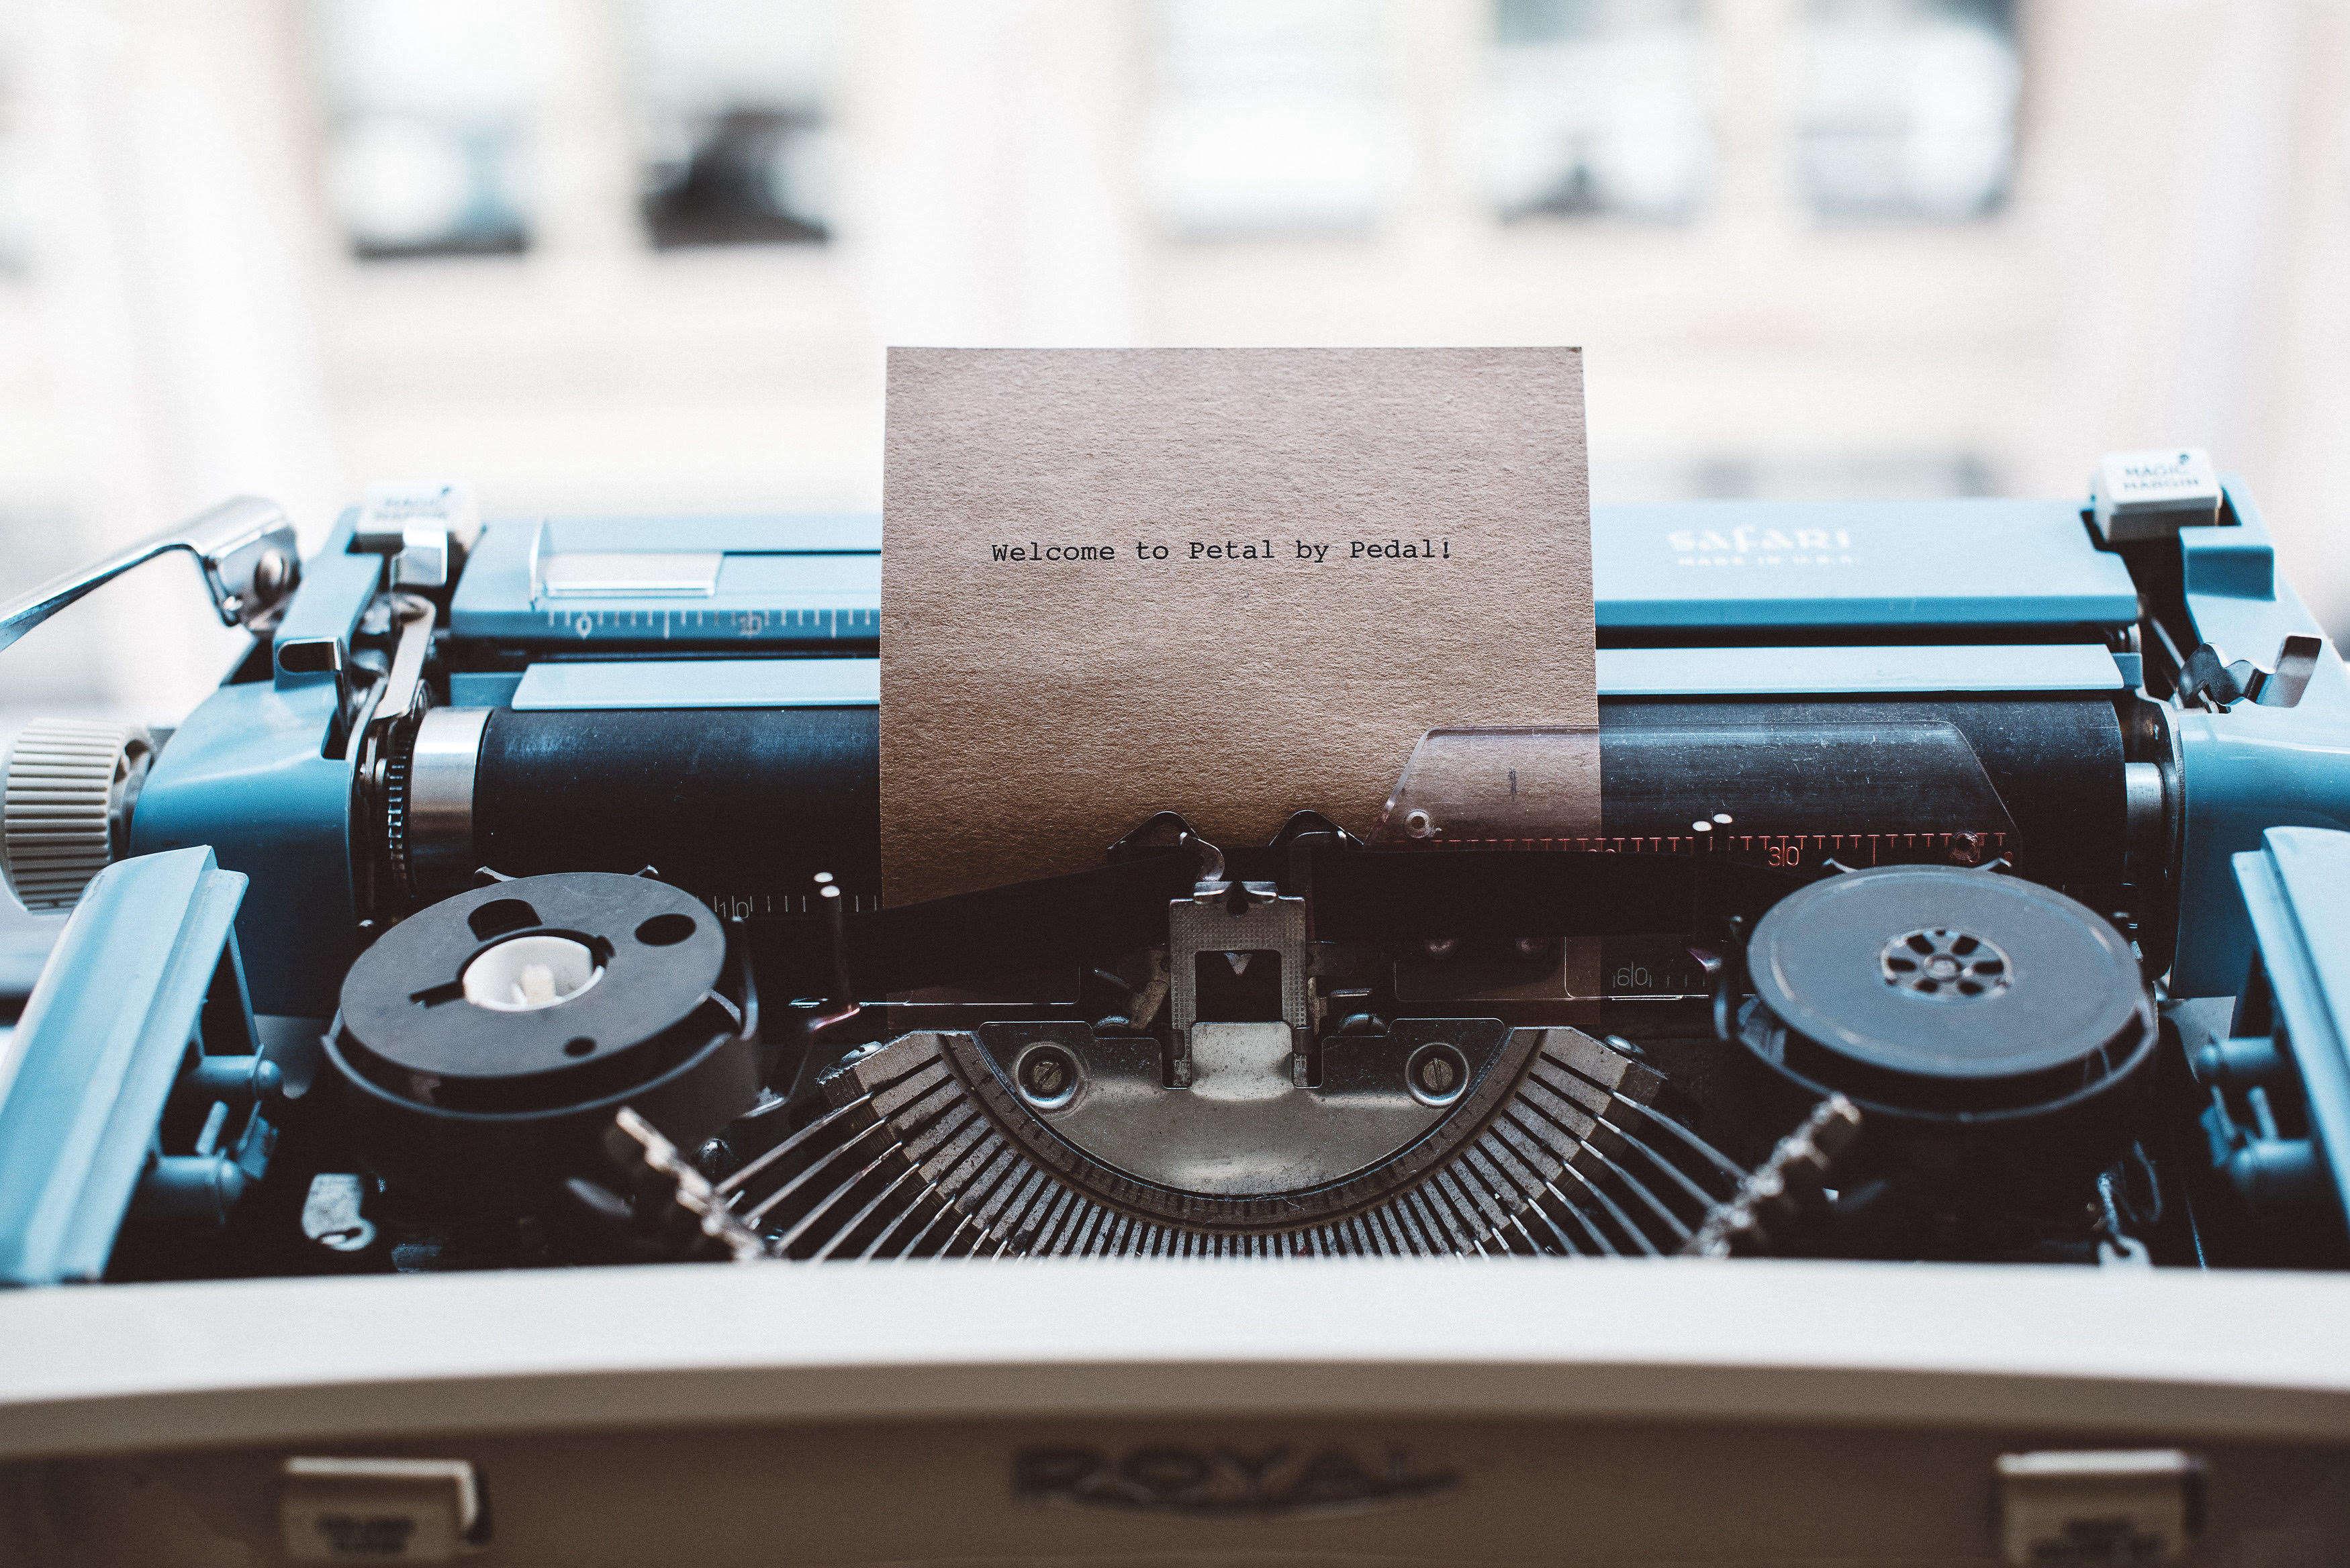 Petal by Pedal Card in Typewriter